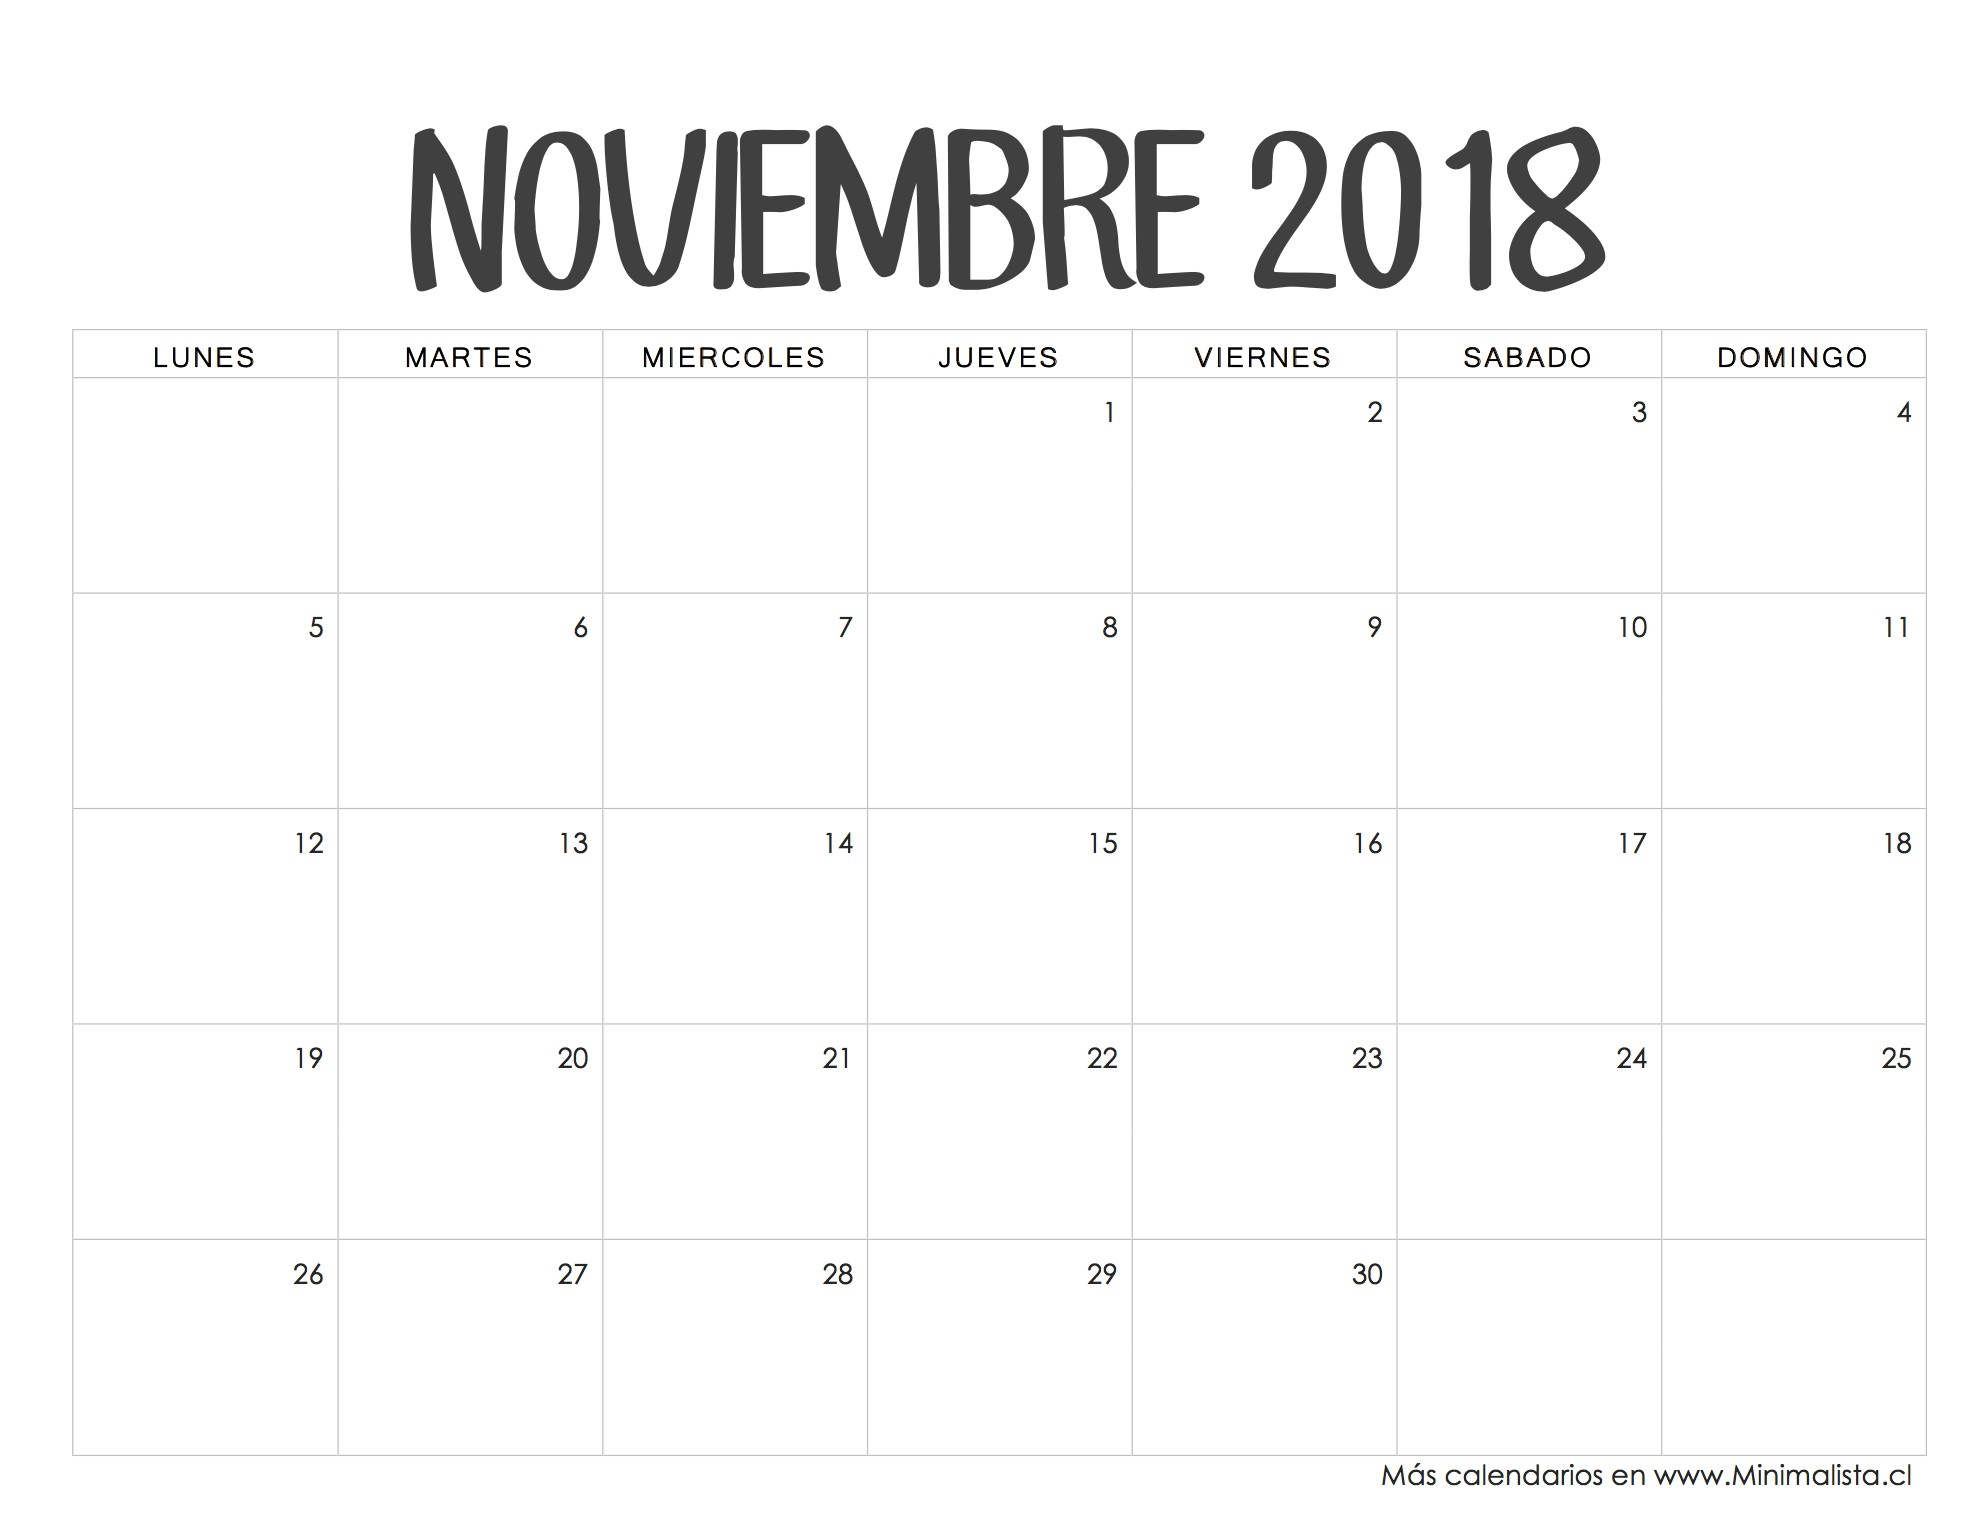 Calendario Infantil 2019 Para Imprimir Más Actual Calendario Noviembre 2018 Printables Pinterest Of Calendario Infantil 2019 Para Imprimir Más Caliente Calendário 2019